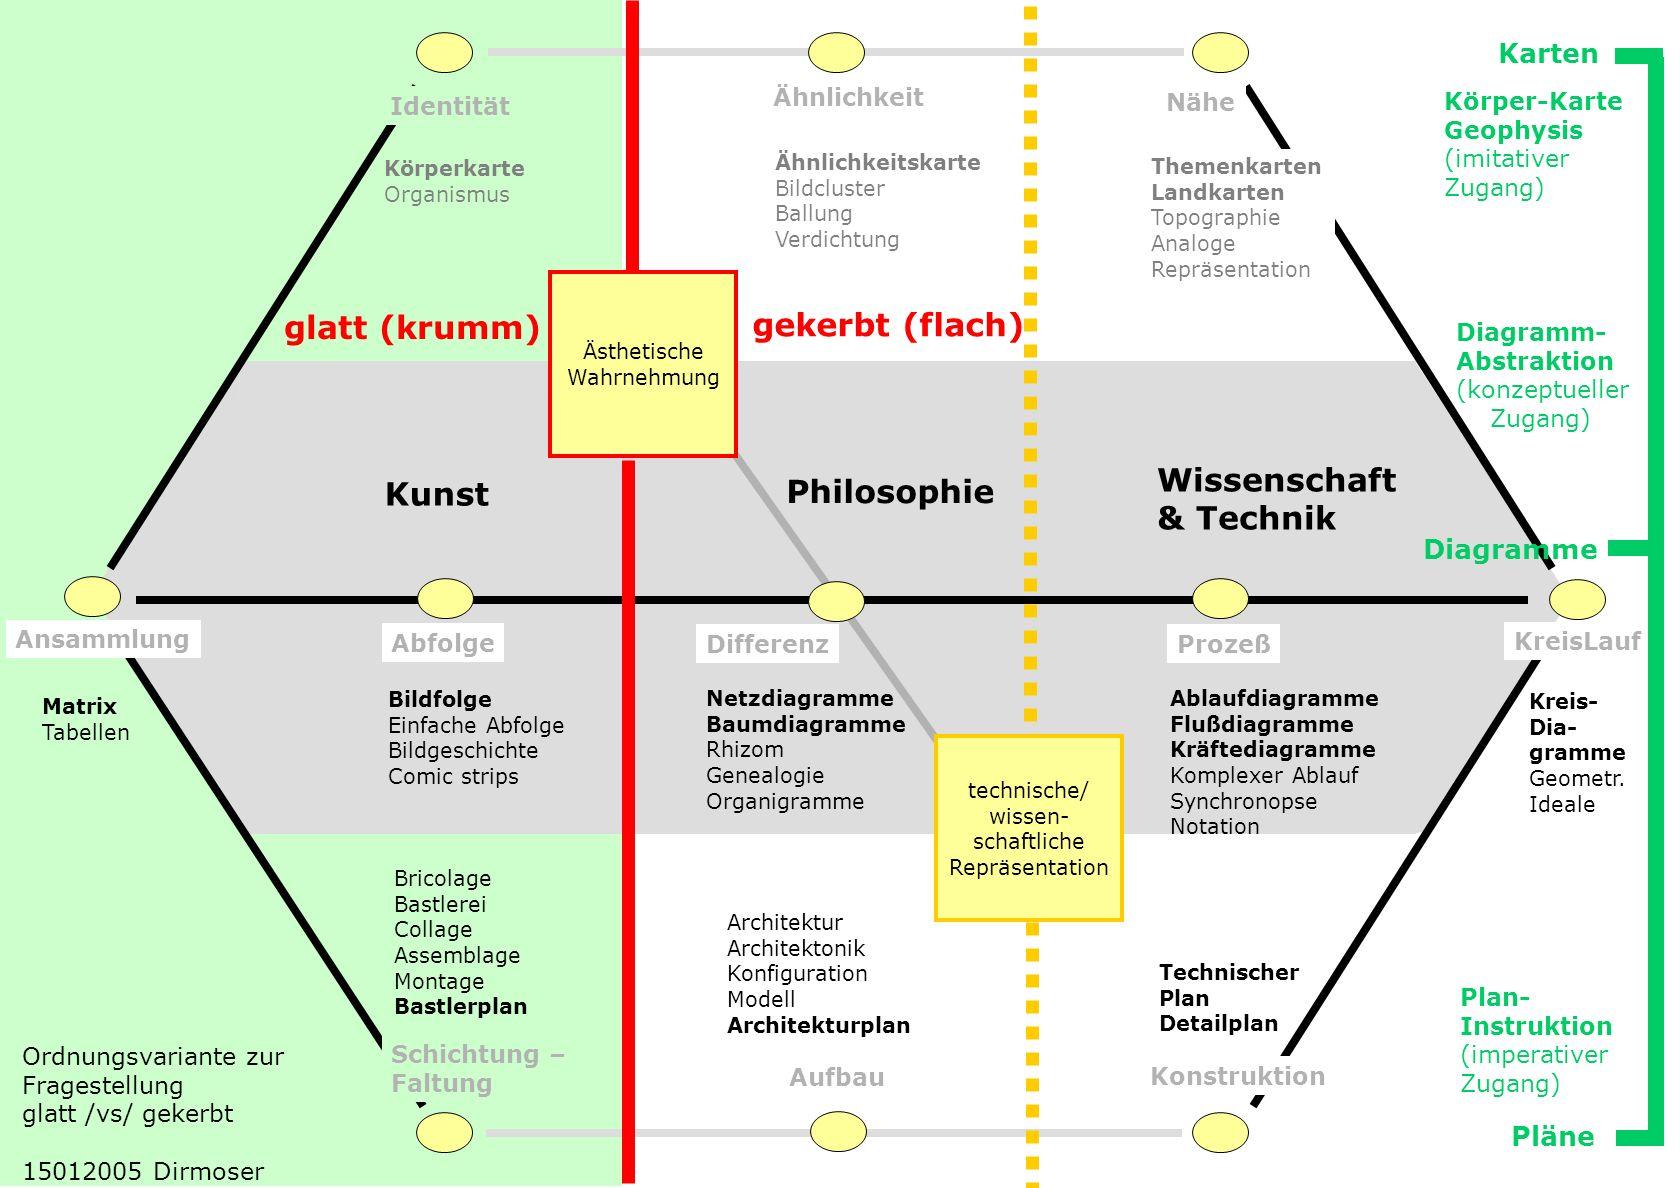 glatt (krumm) gekerbt (flach) Wissenschaft Kunst Philosophie & Technik